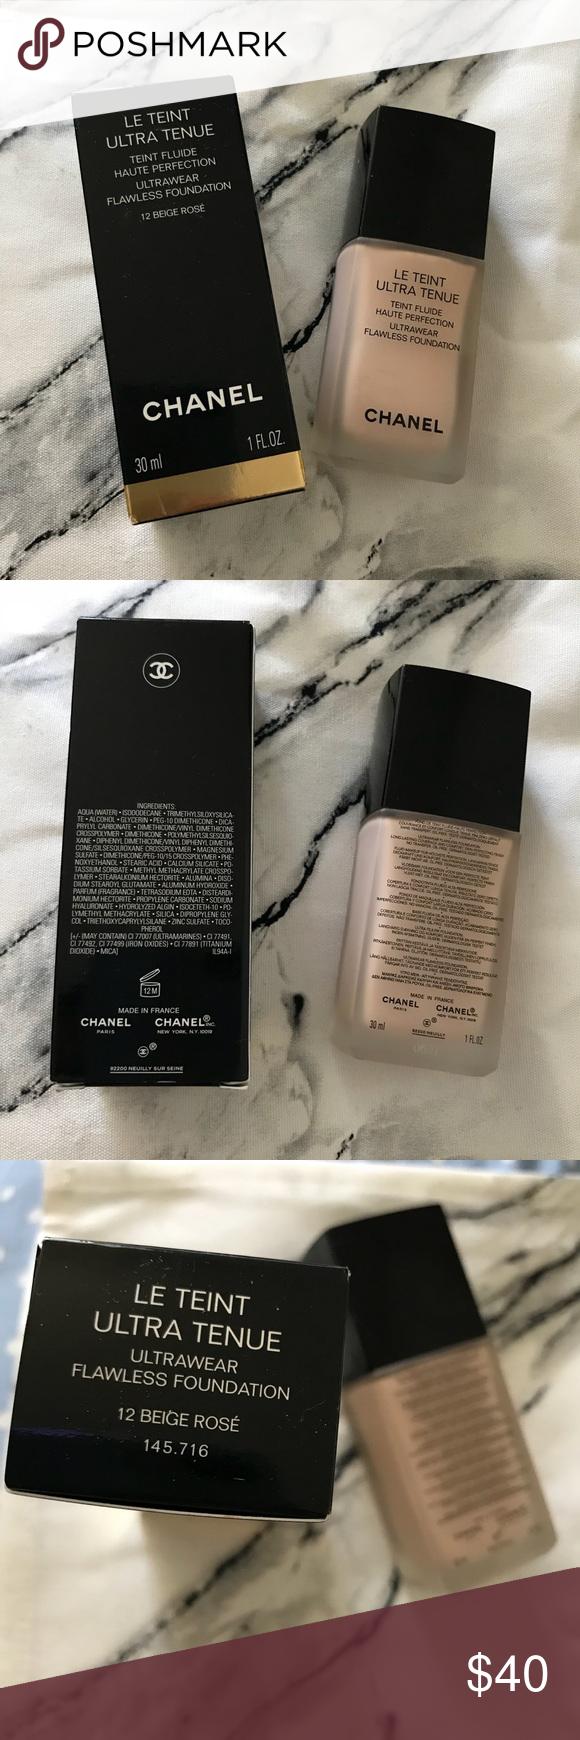 Chanel Ultrawear Flawless Foundation Chanel makeup